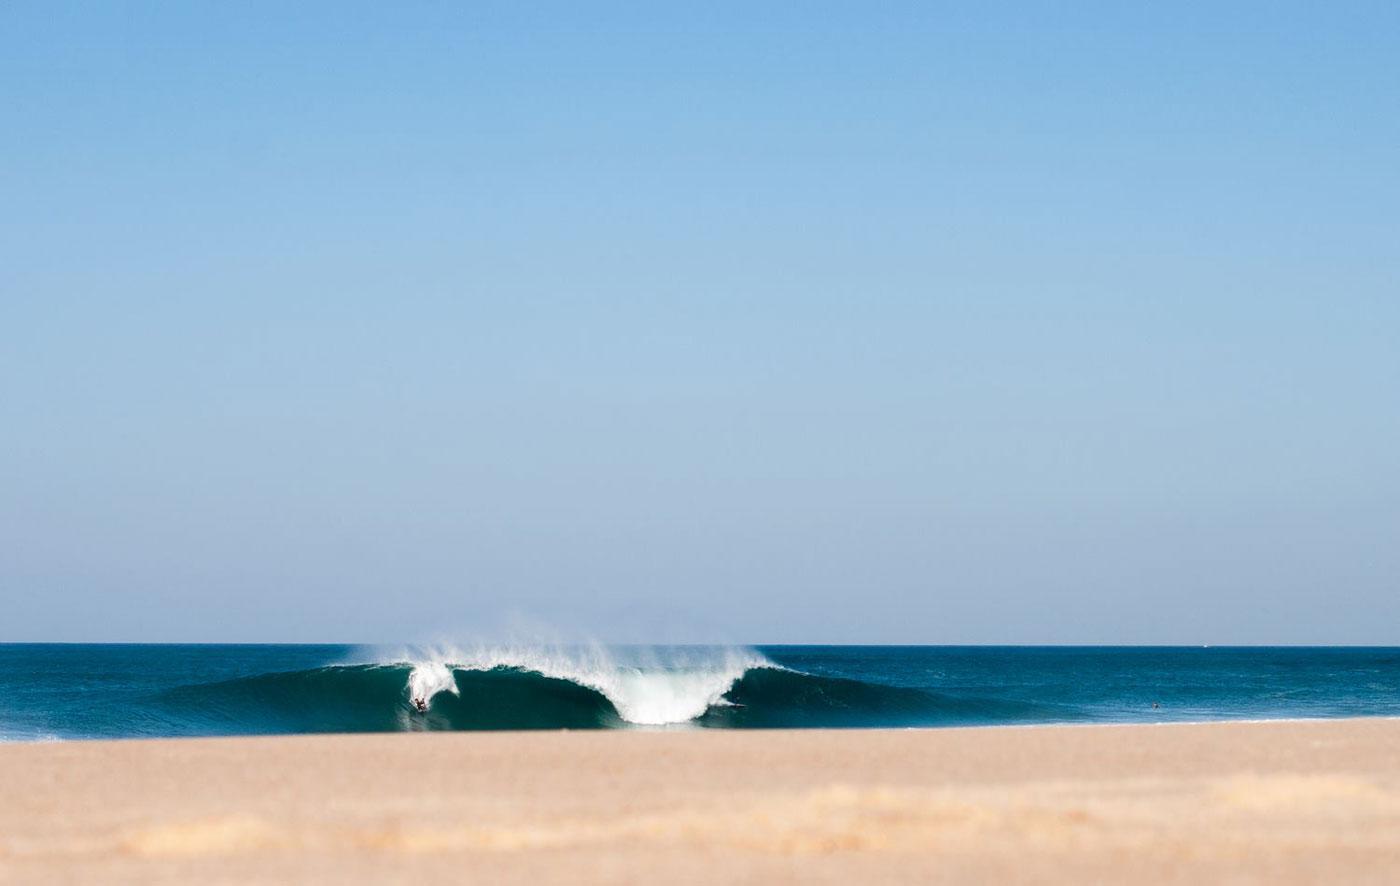 praia_norte_2